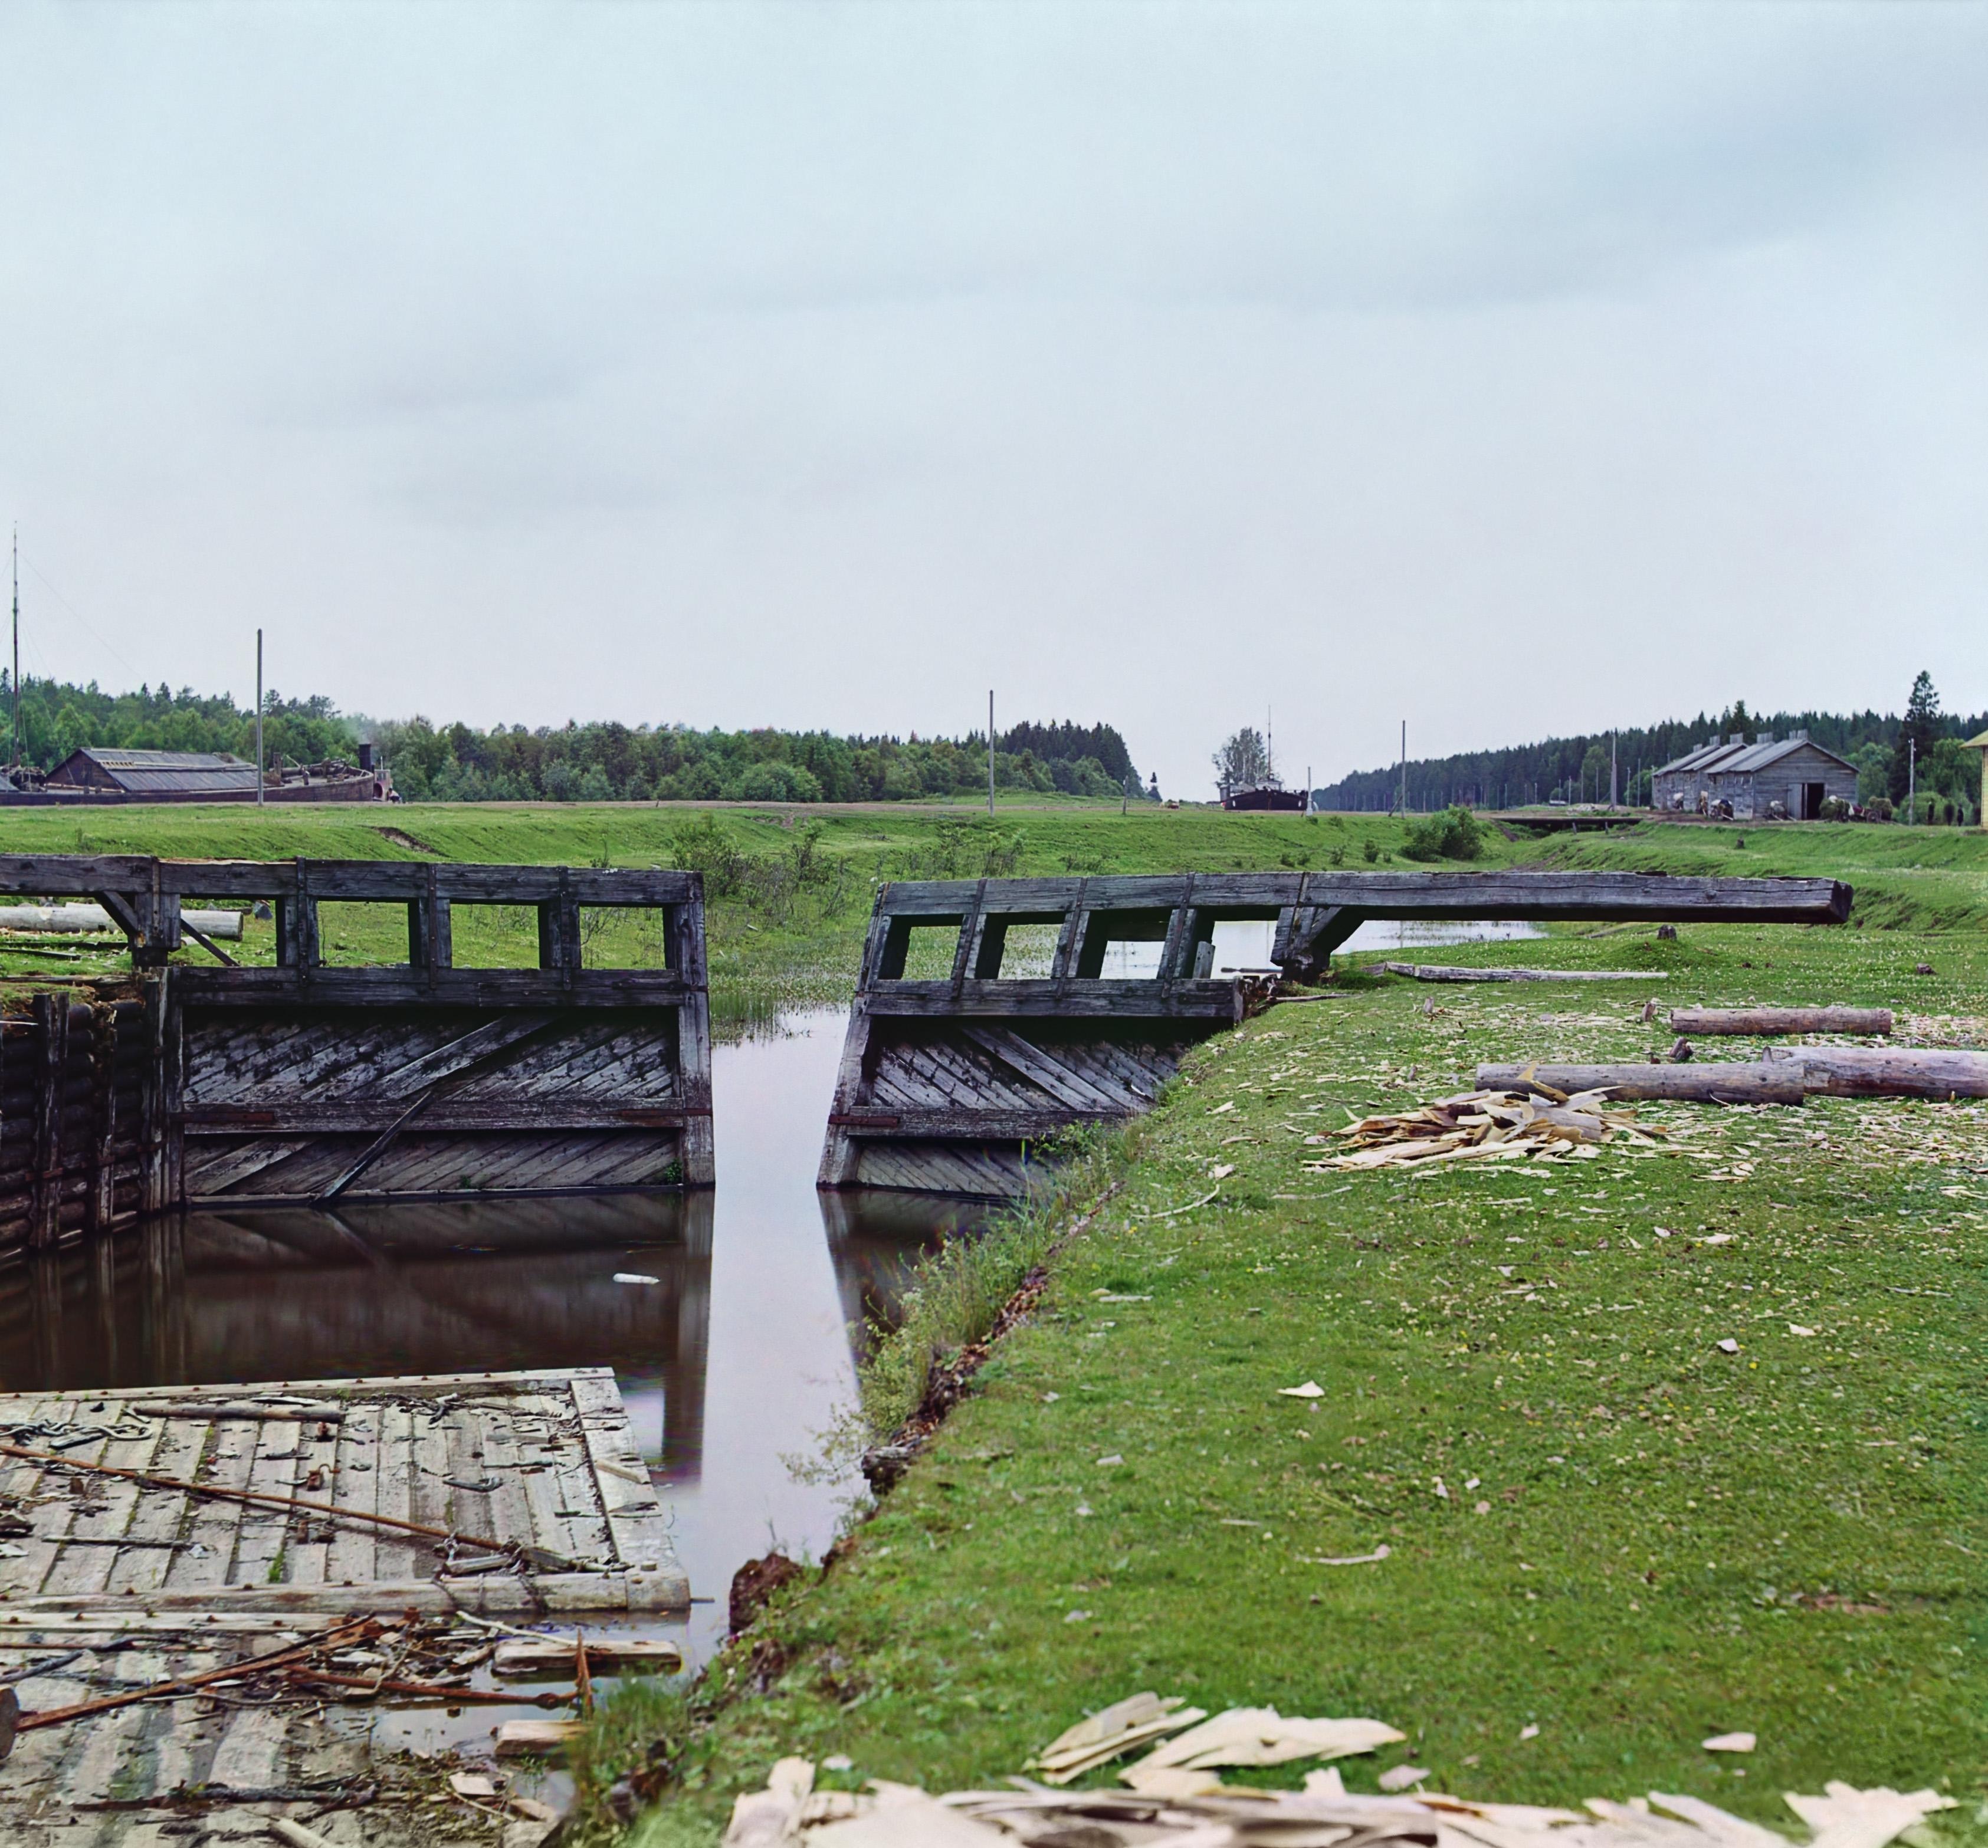 Тип старых шлюзовых ворот. Белозерский канал